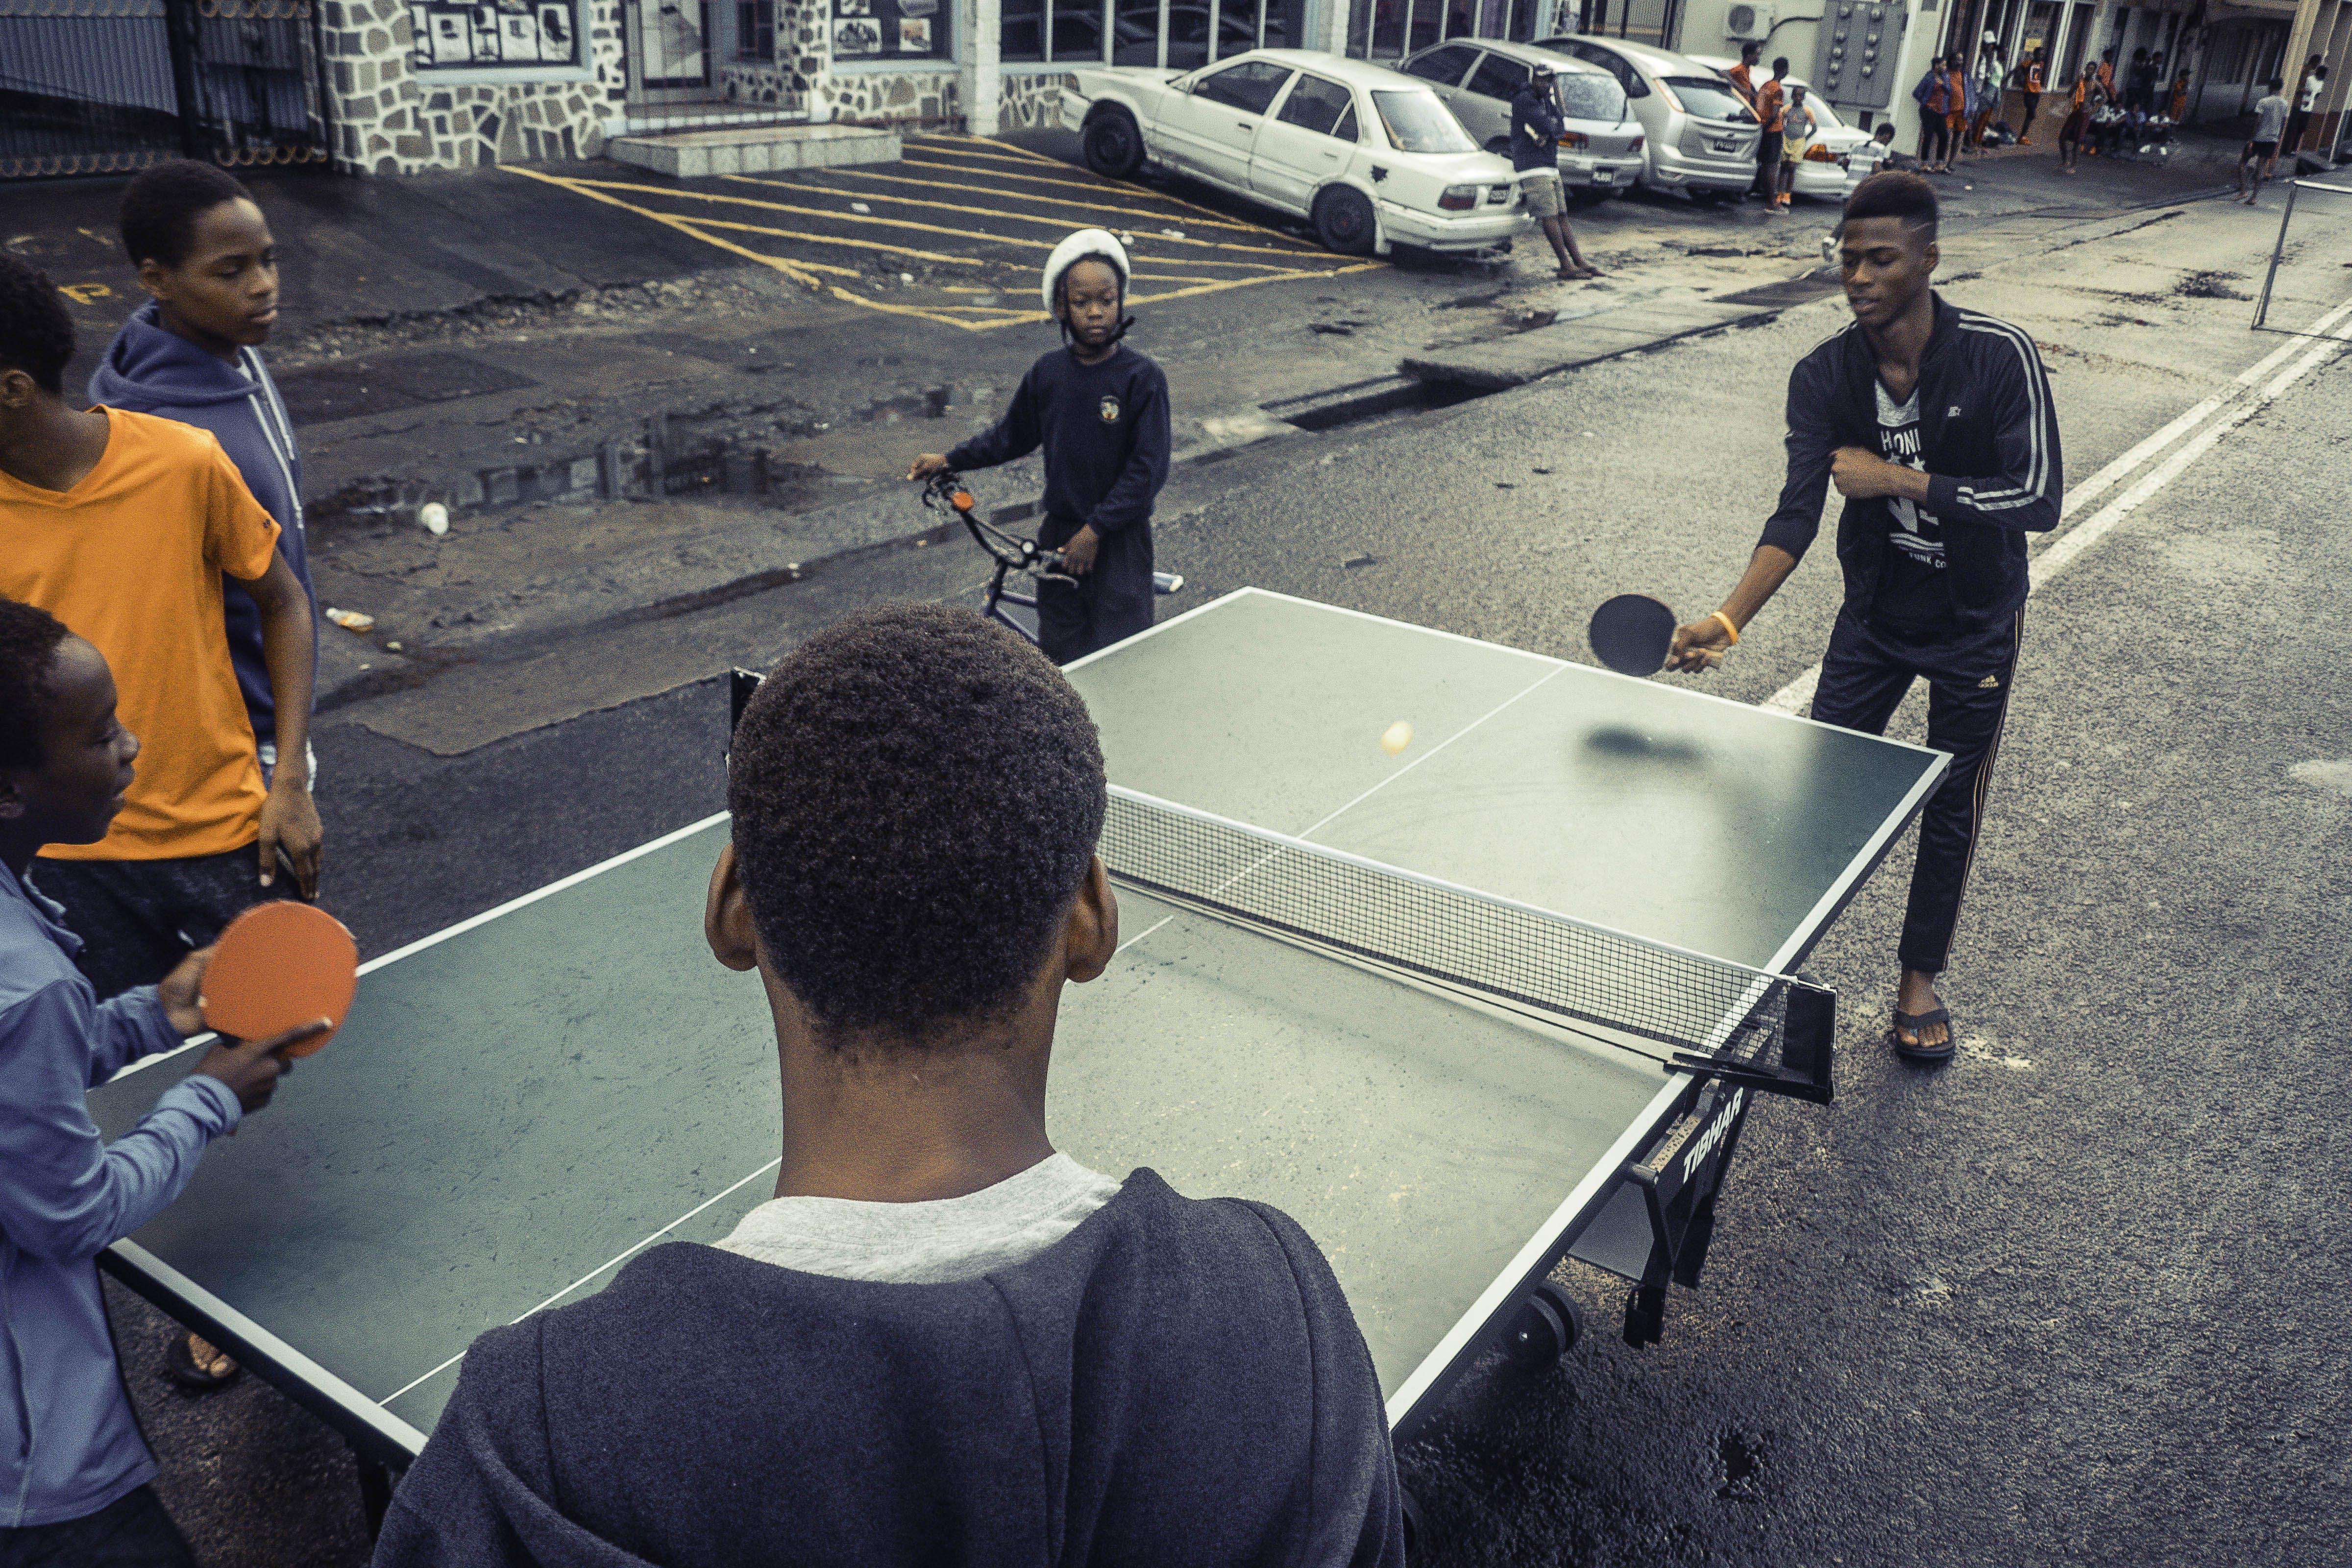 Free stock photo of street sports, table tennis